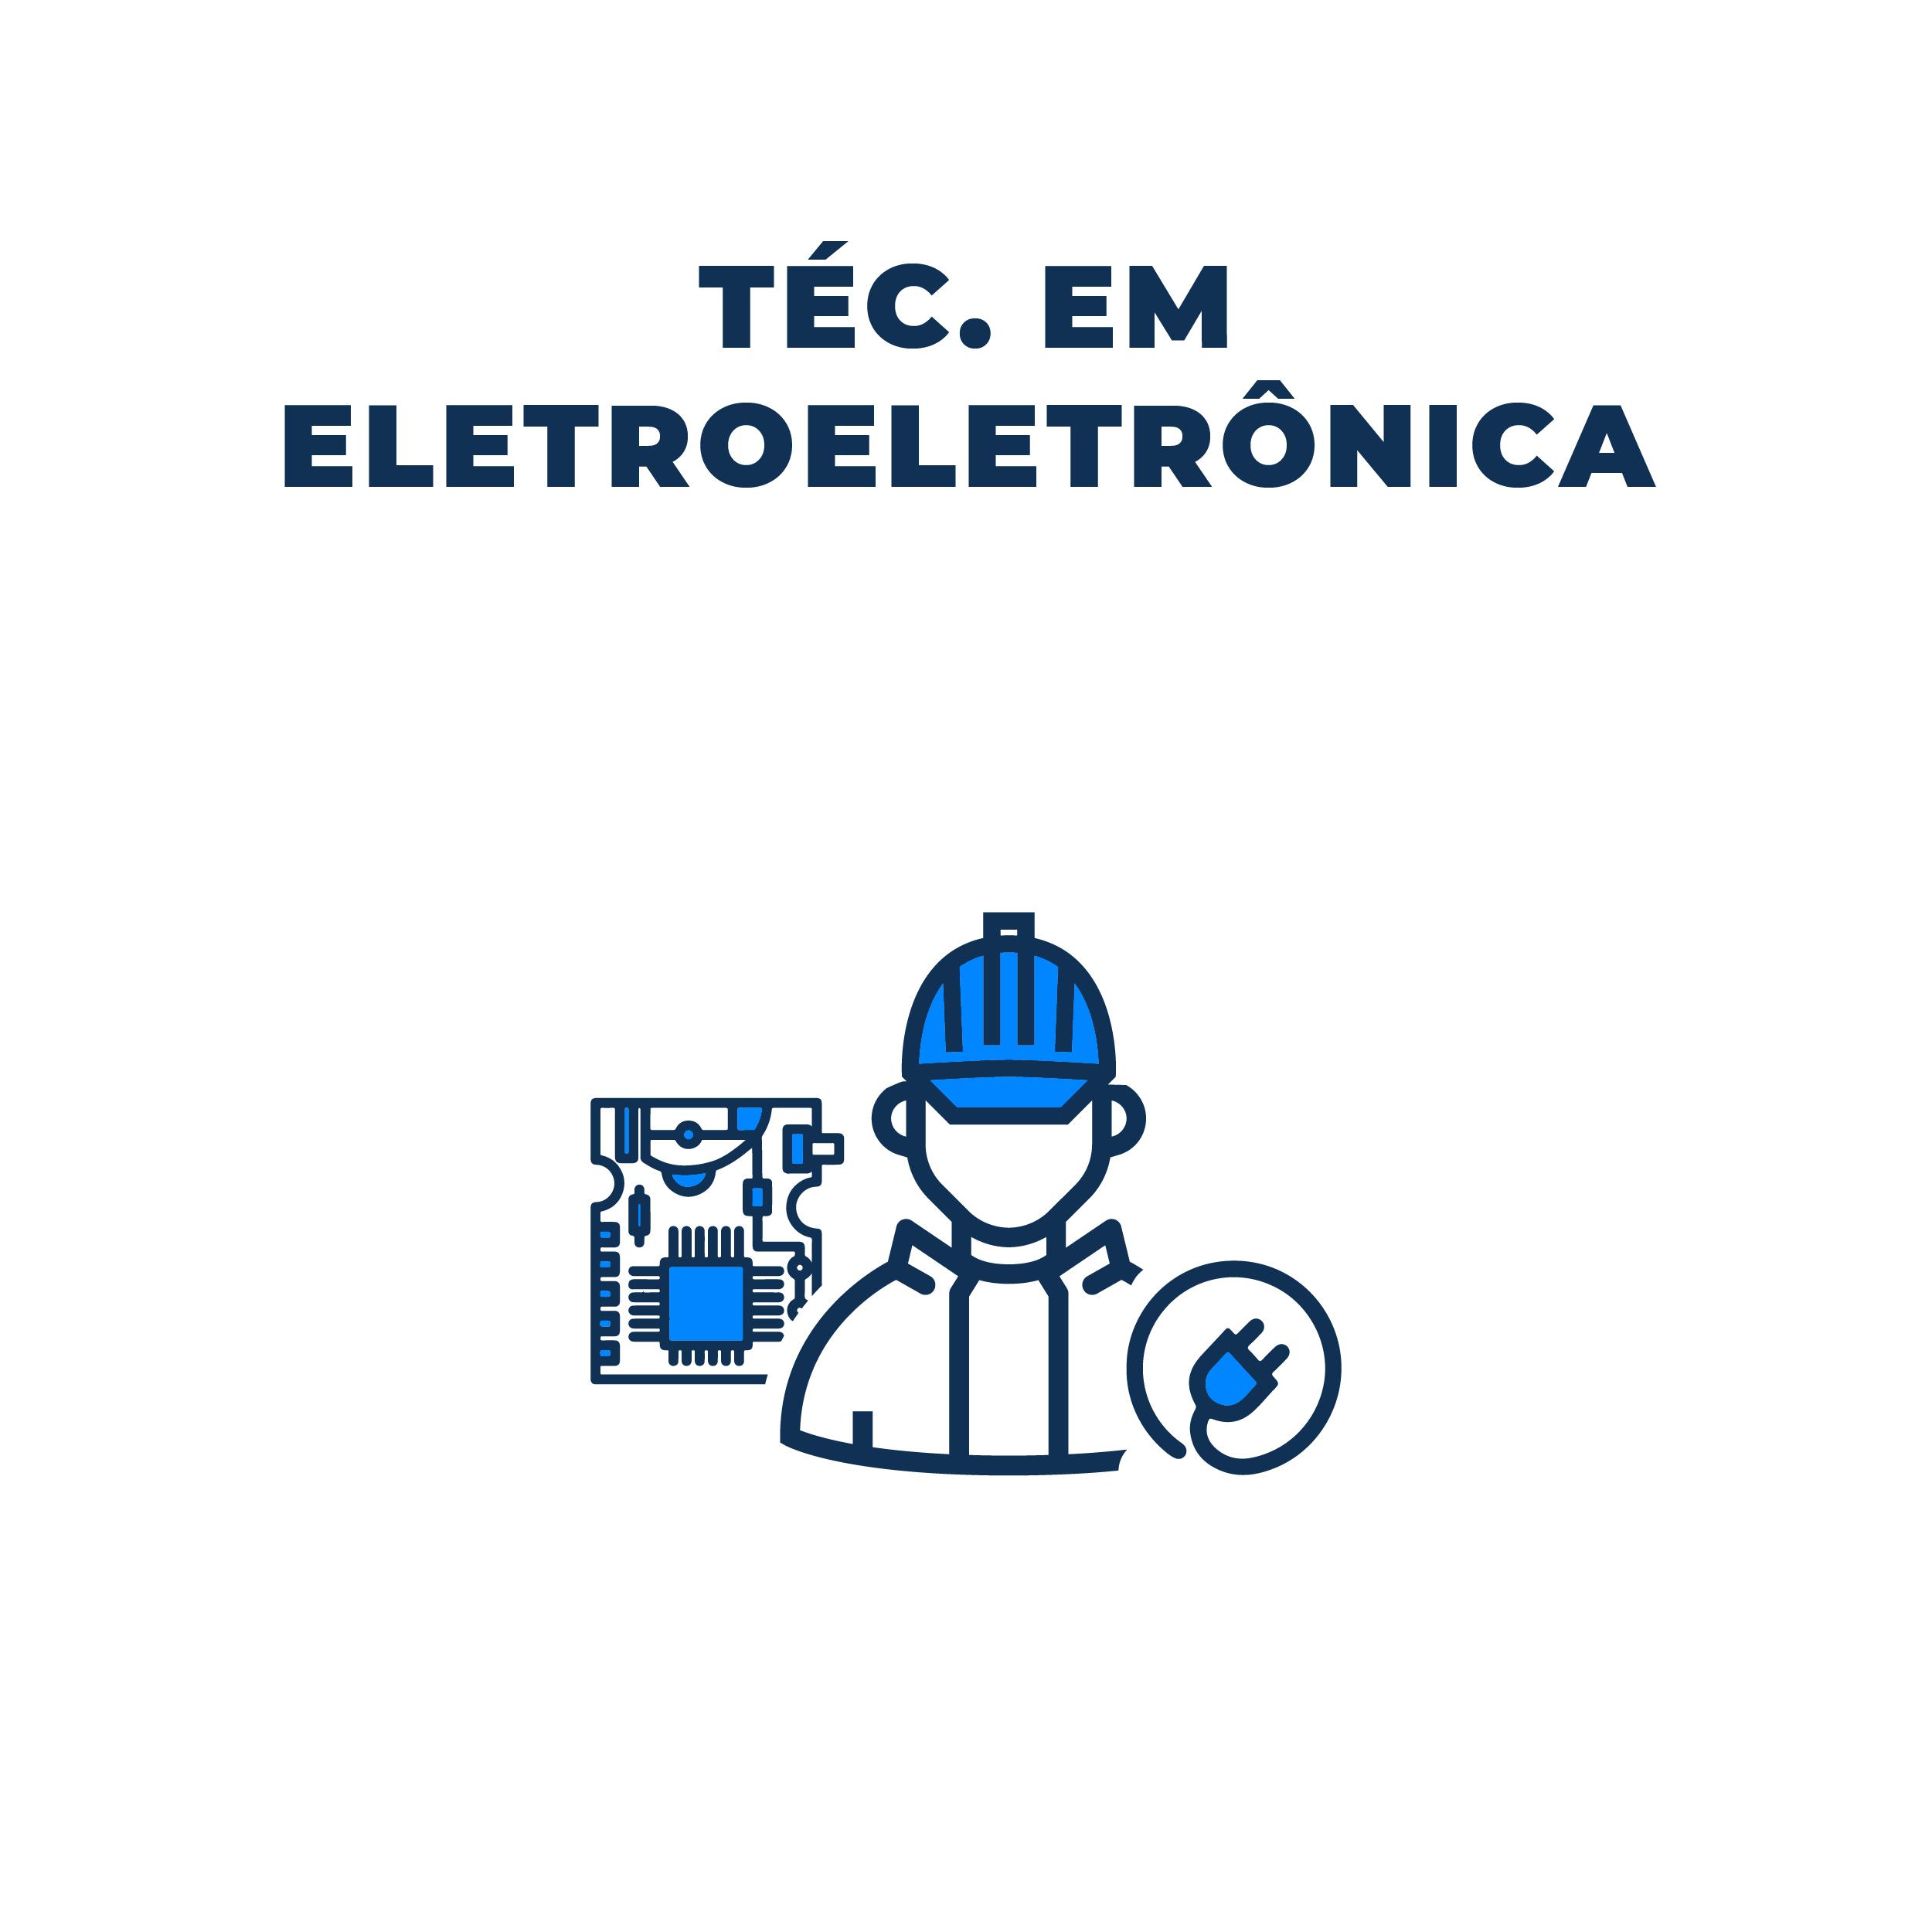 eletroeletronica